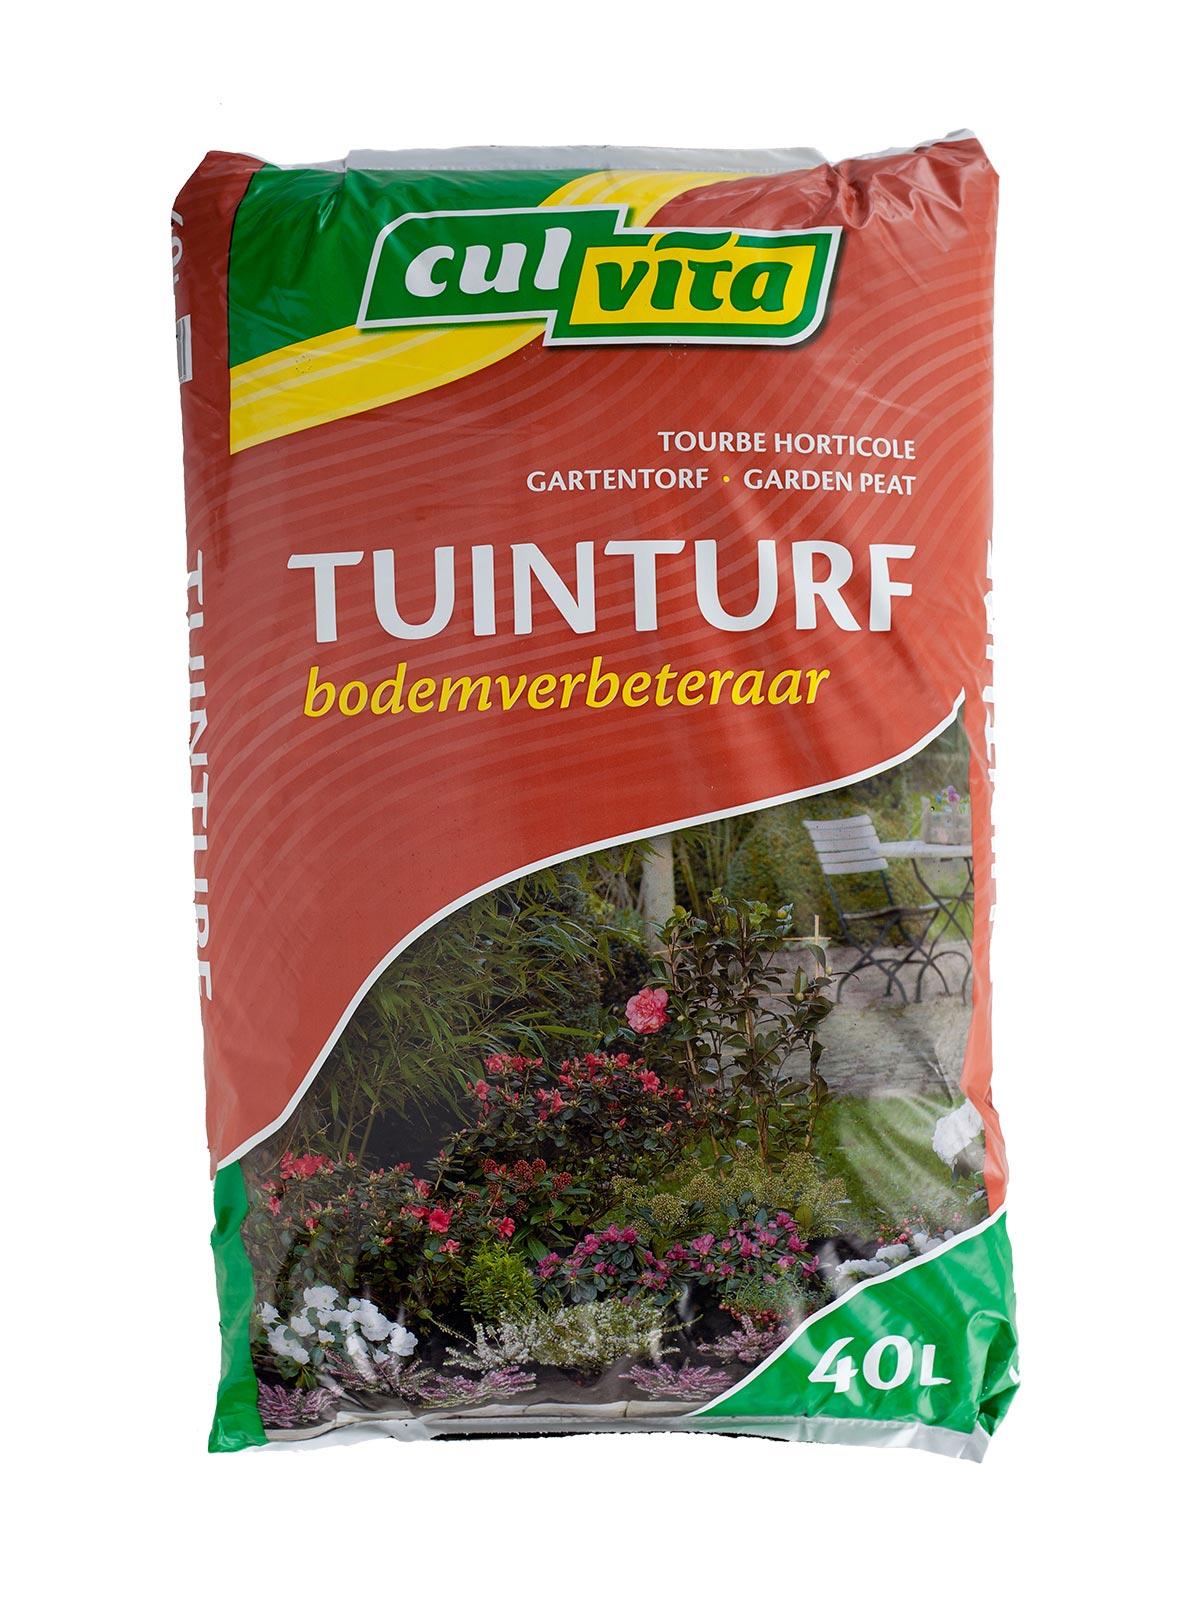 Culvita Tuinturf | Culvita.nl